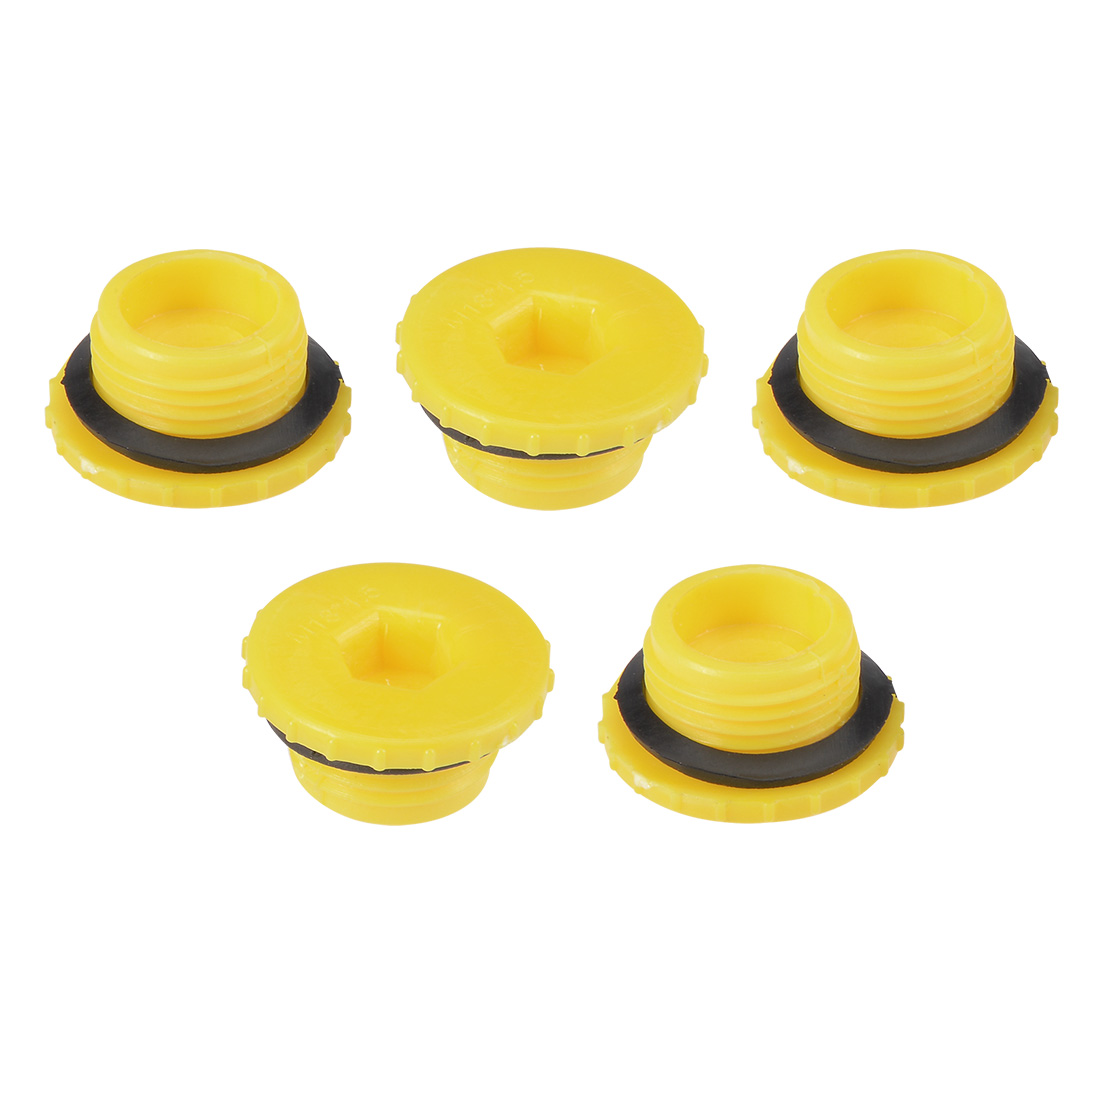 MLD-M18 M18 Hex Socket Design PE Plastic Male Threaded Sealing Cap Yellow 5pcs